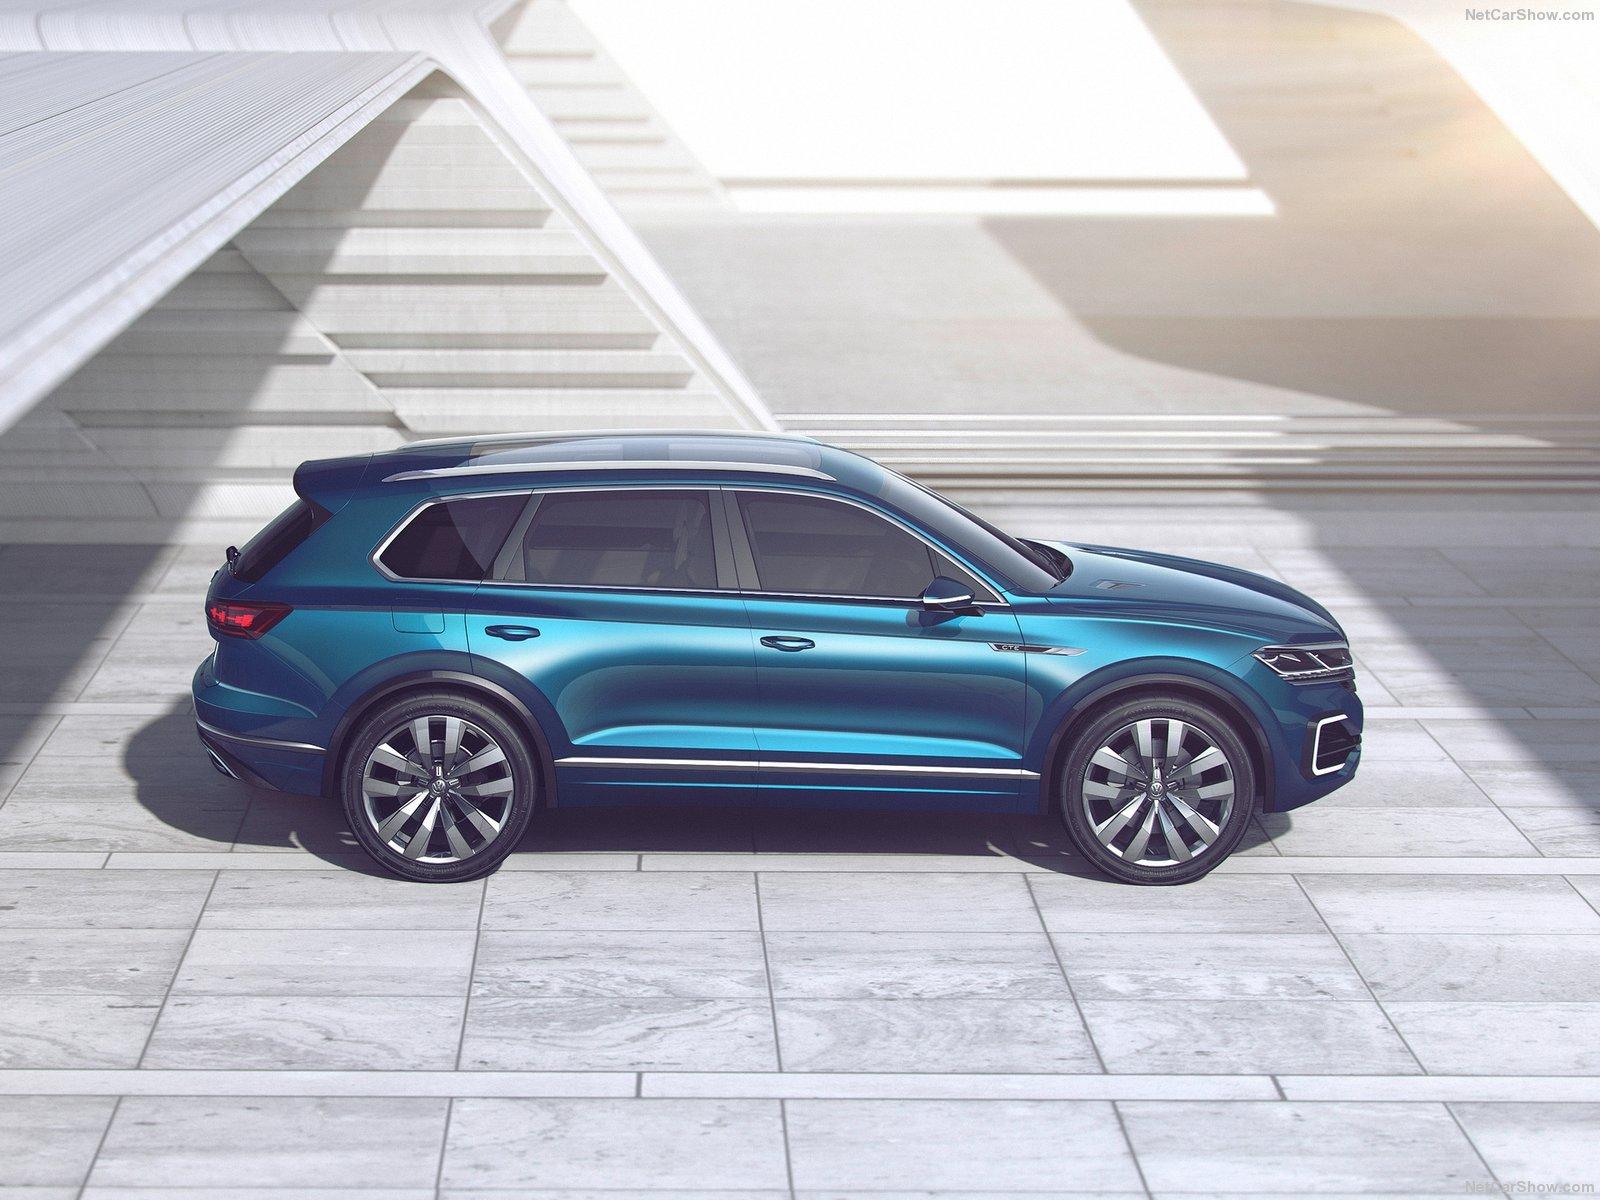 Volkswagen-T-Prime_GTE_Concept-2016-1600-0d